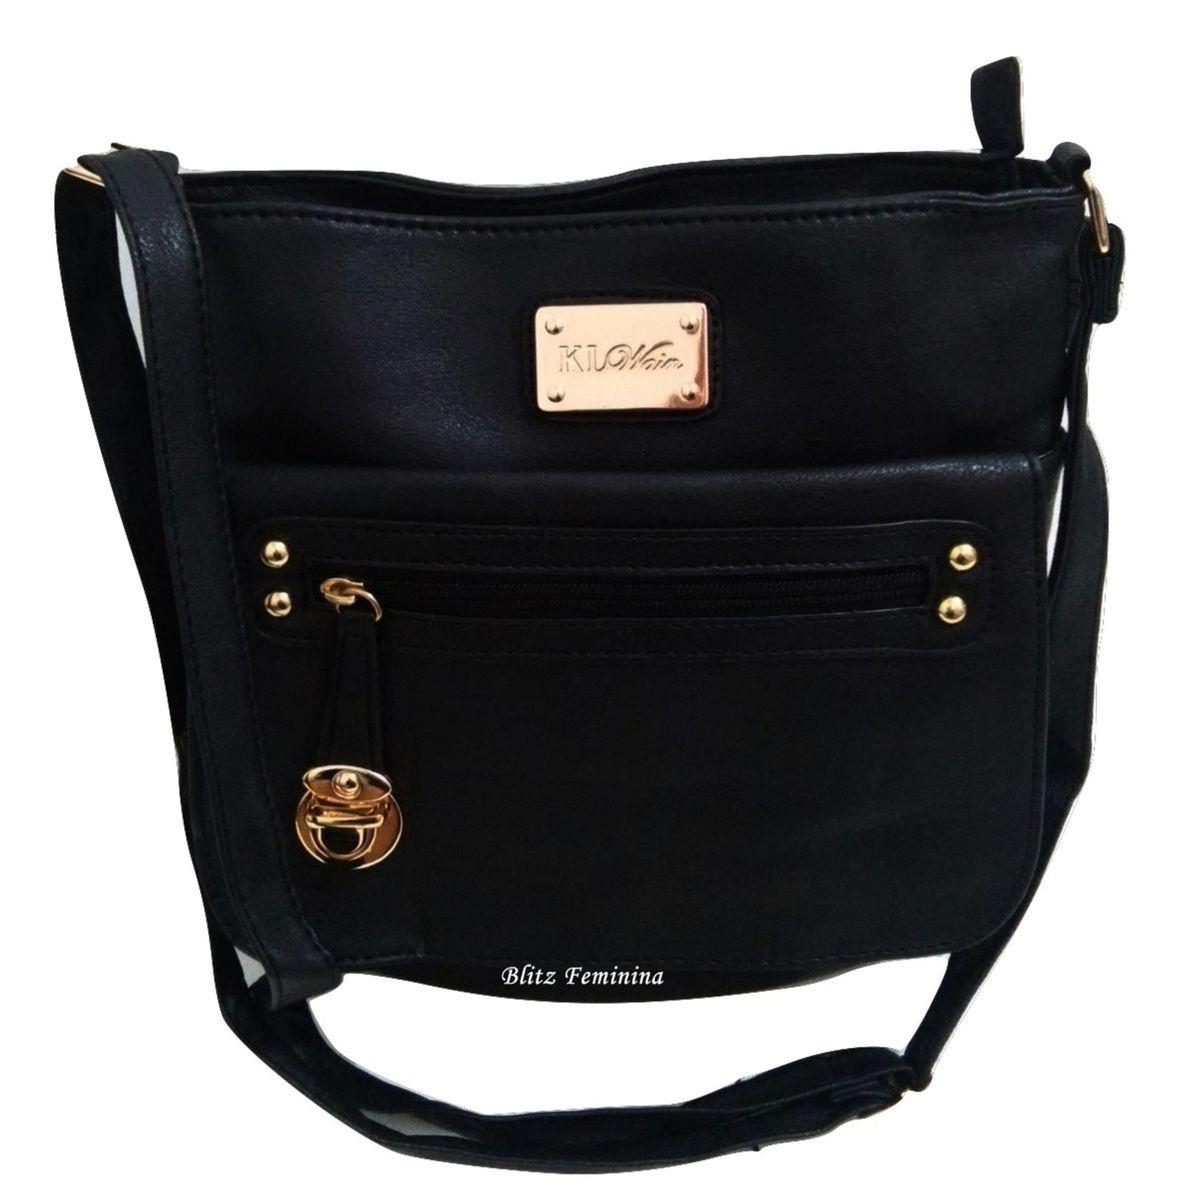 a0a31e9267592 bolsa transversal feminina preta faculdade notebook atacado varejo - ombro  sem marca